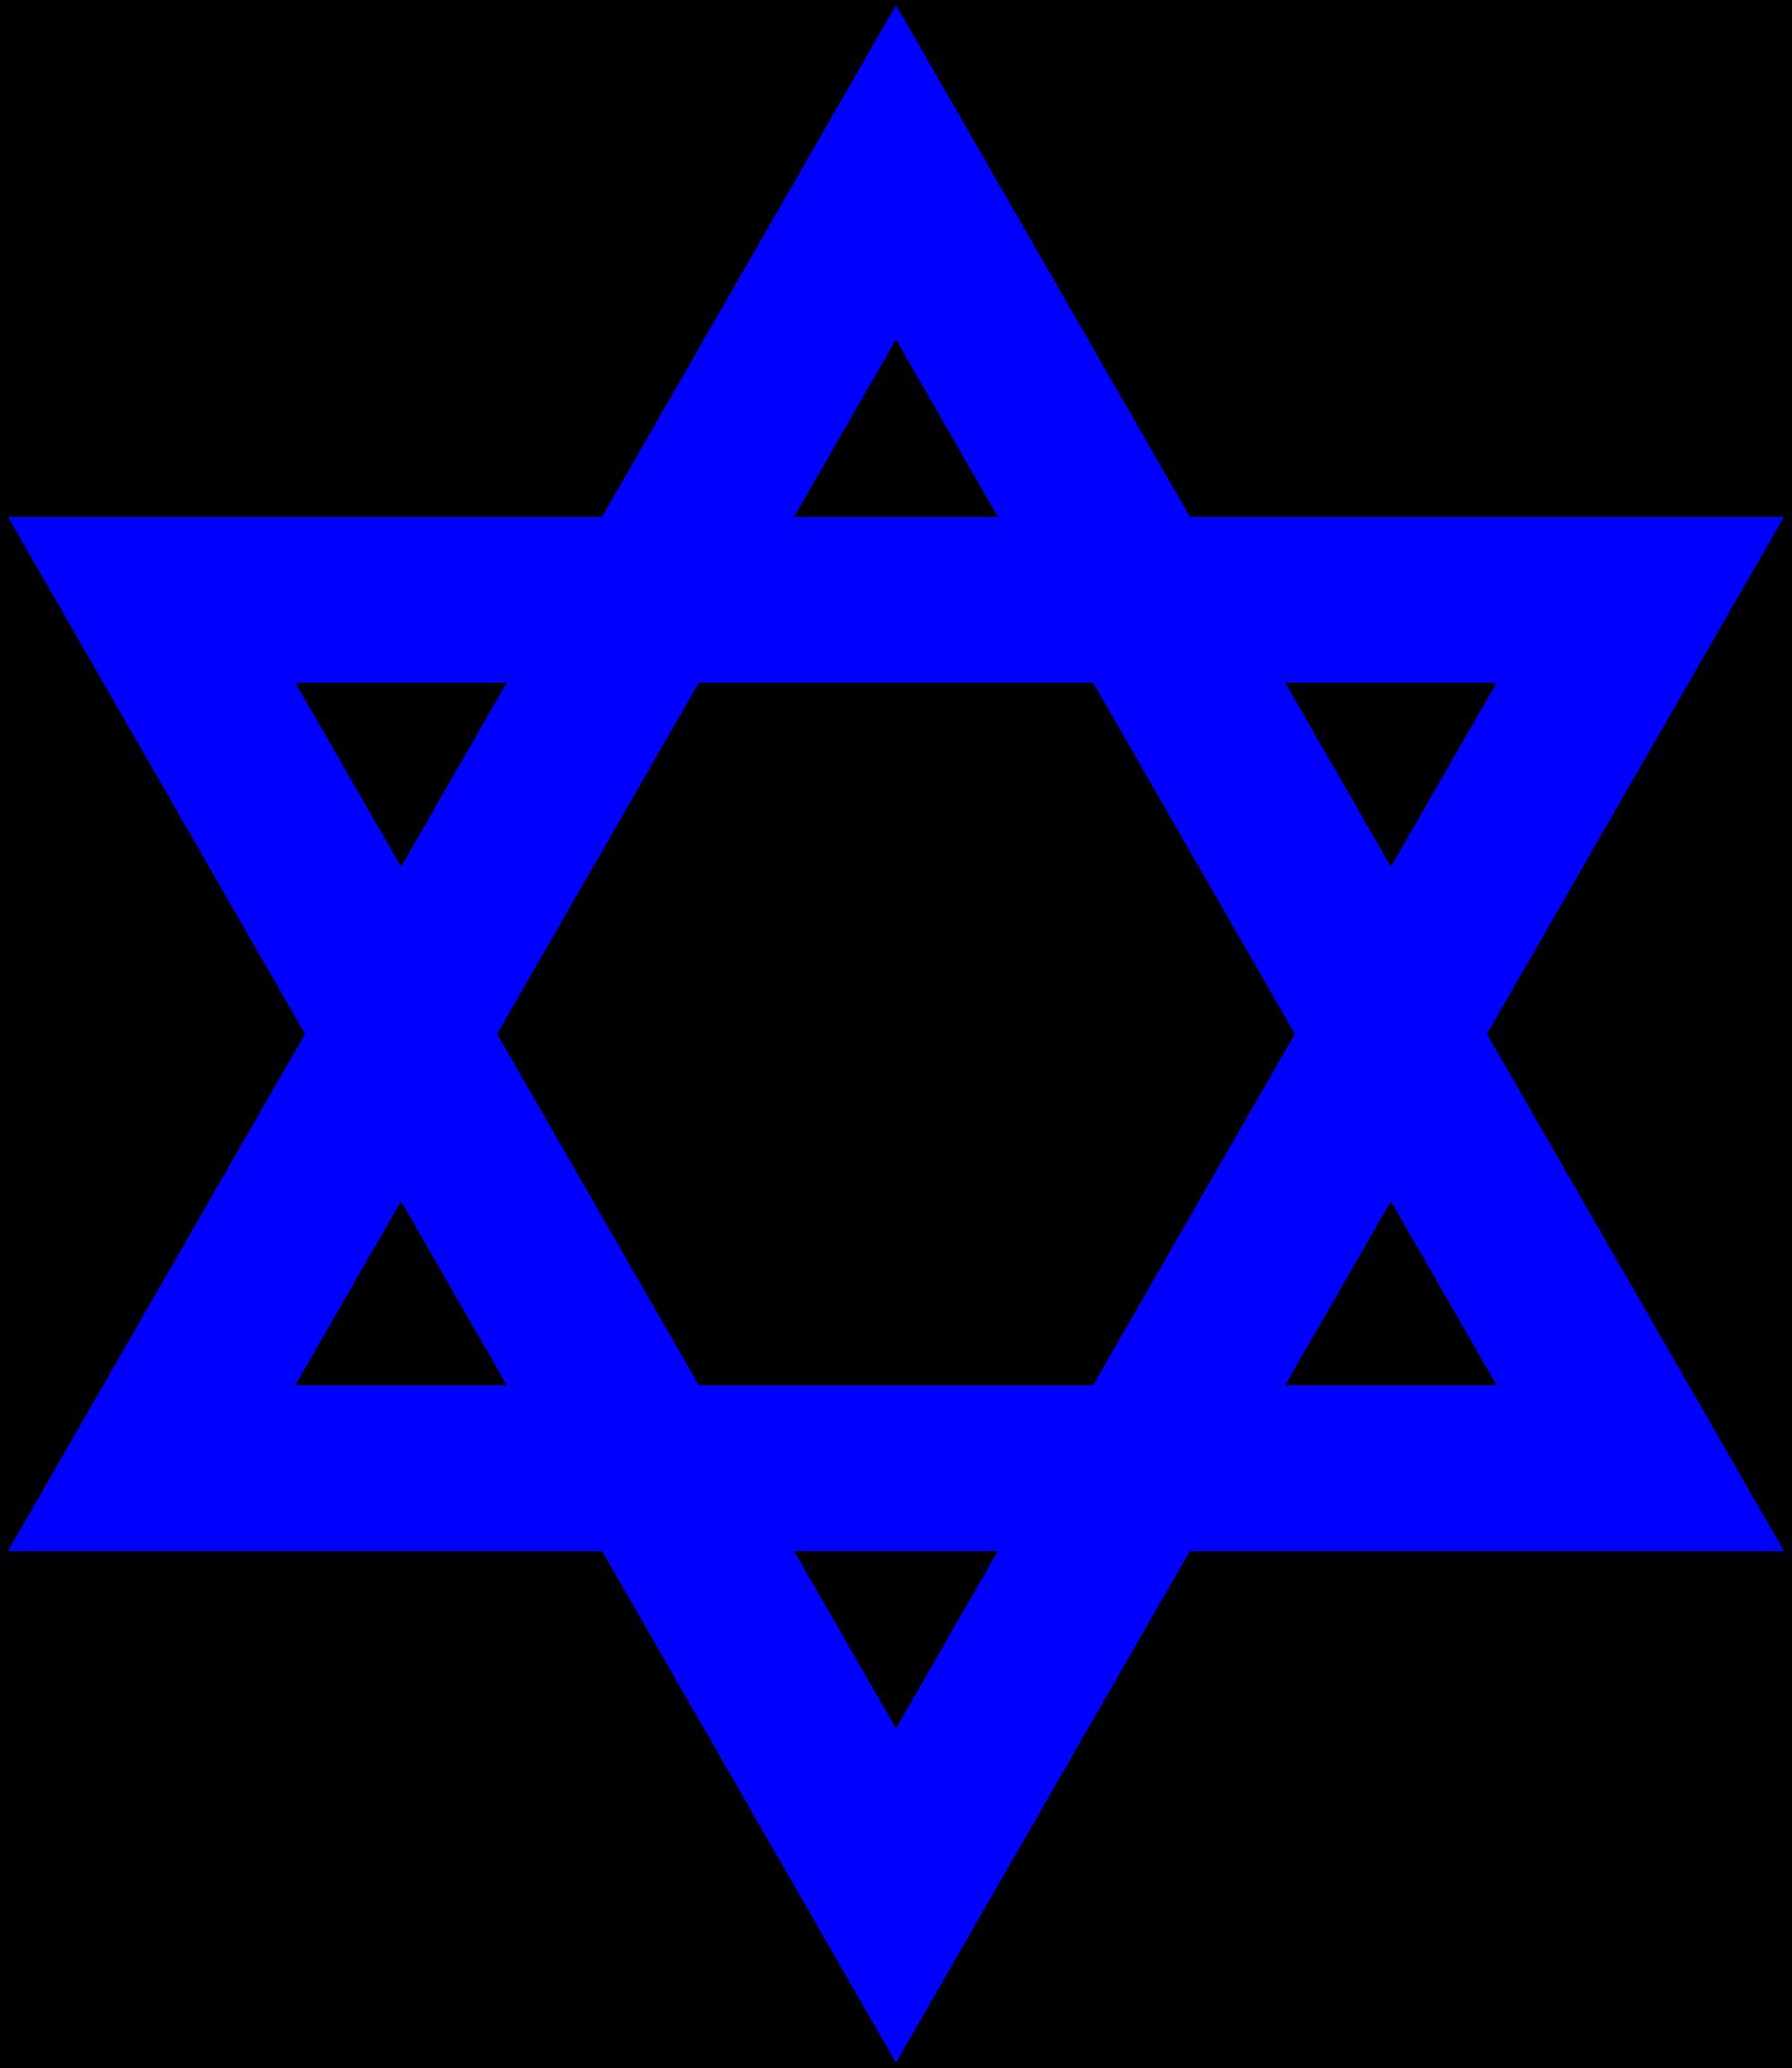 Jewish star of david clipart jpg black and white stock Jewish Clip Art Free - ClipArt Best jpg black and white stock